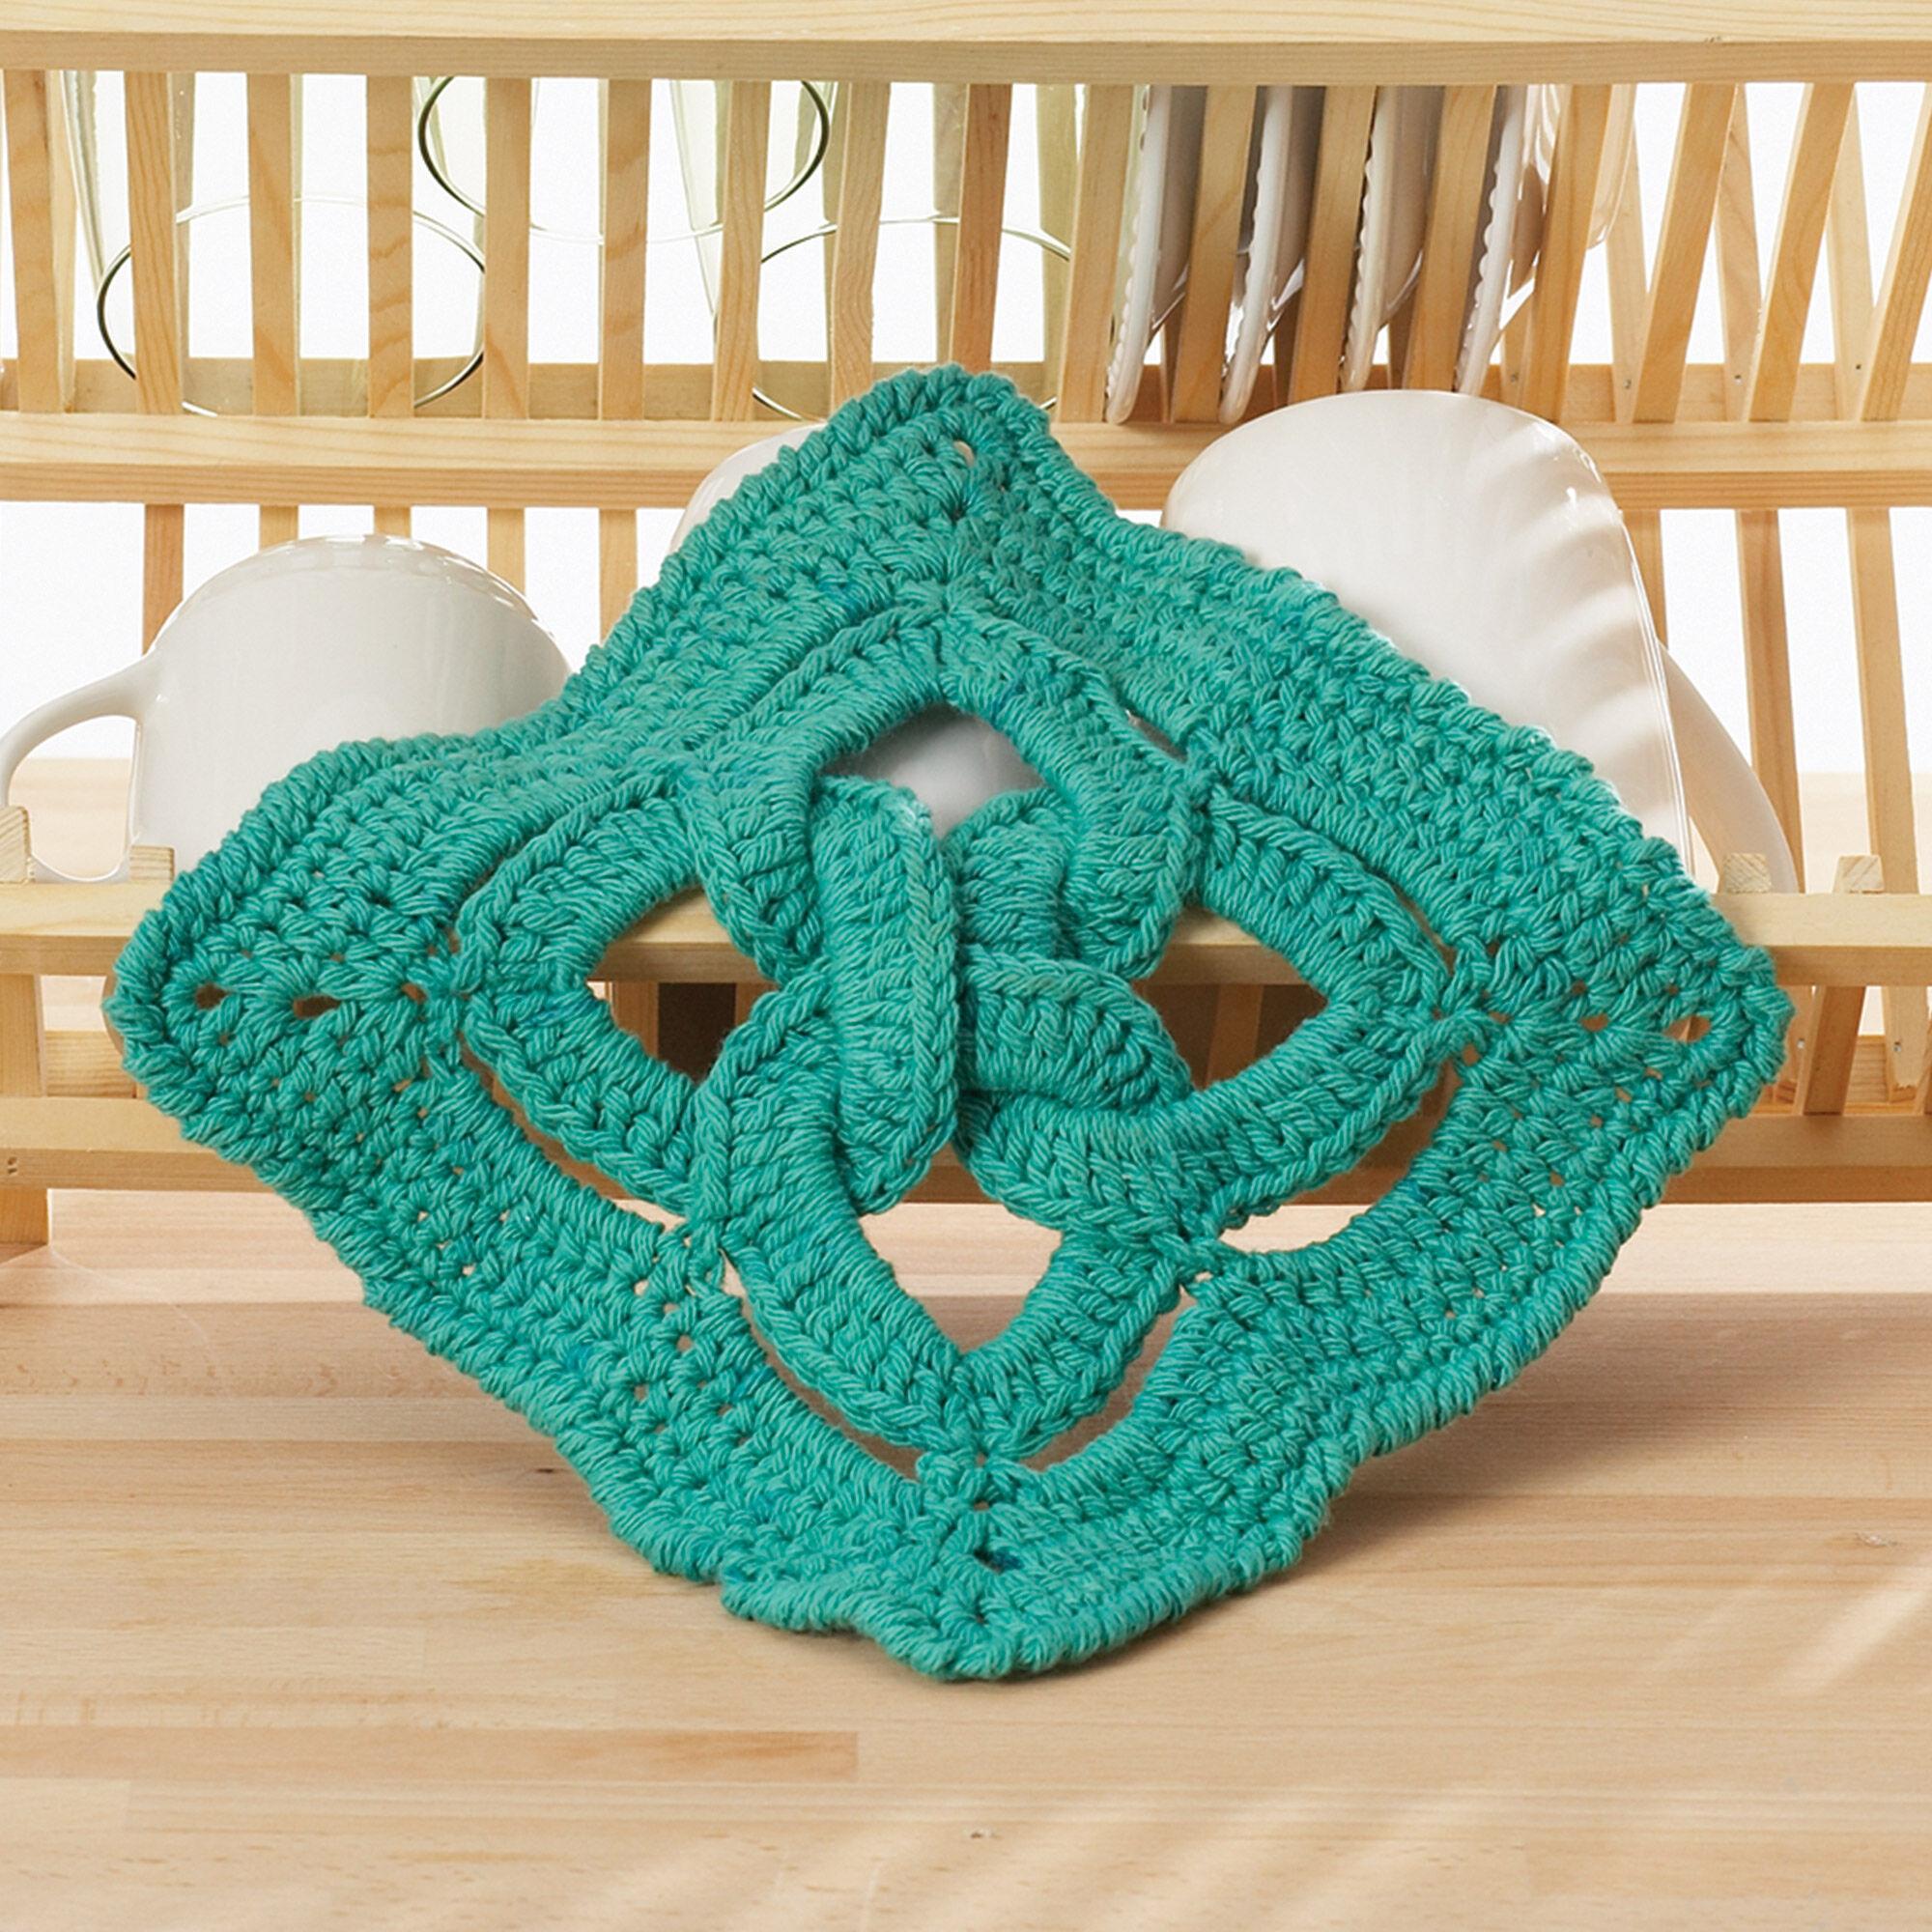 Lily Sugar\'n Cream Celtic Knot Dishcloth   Yarnspirations